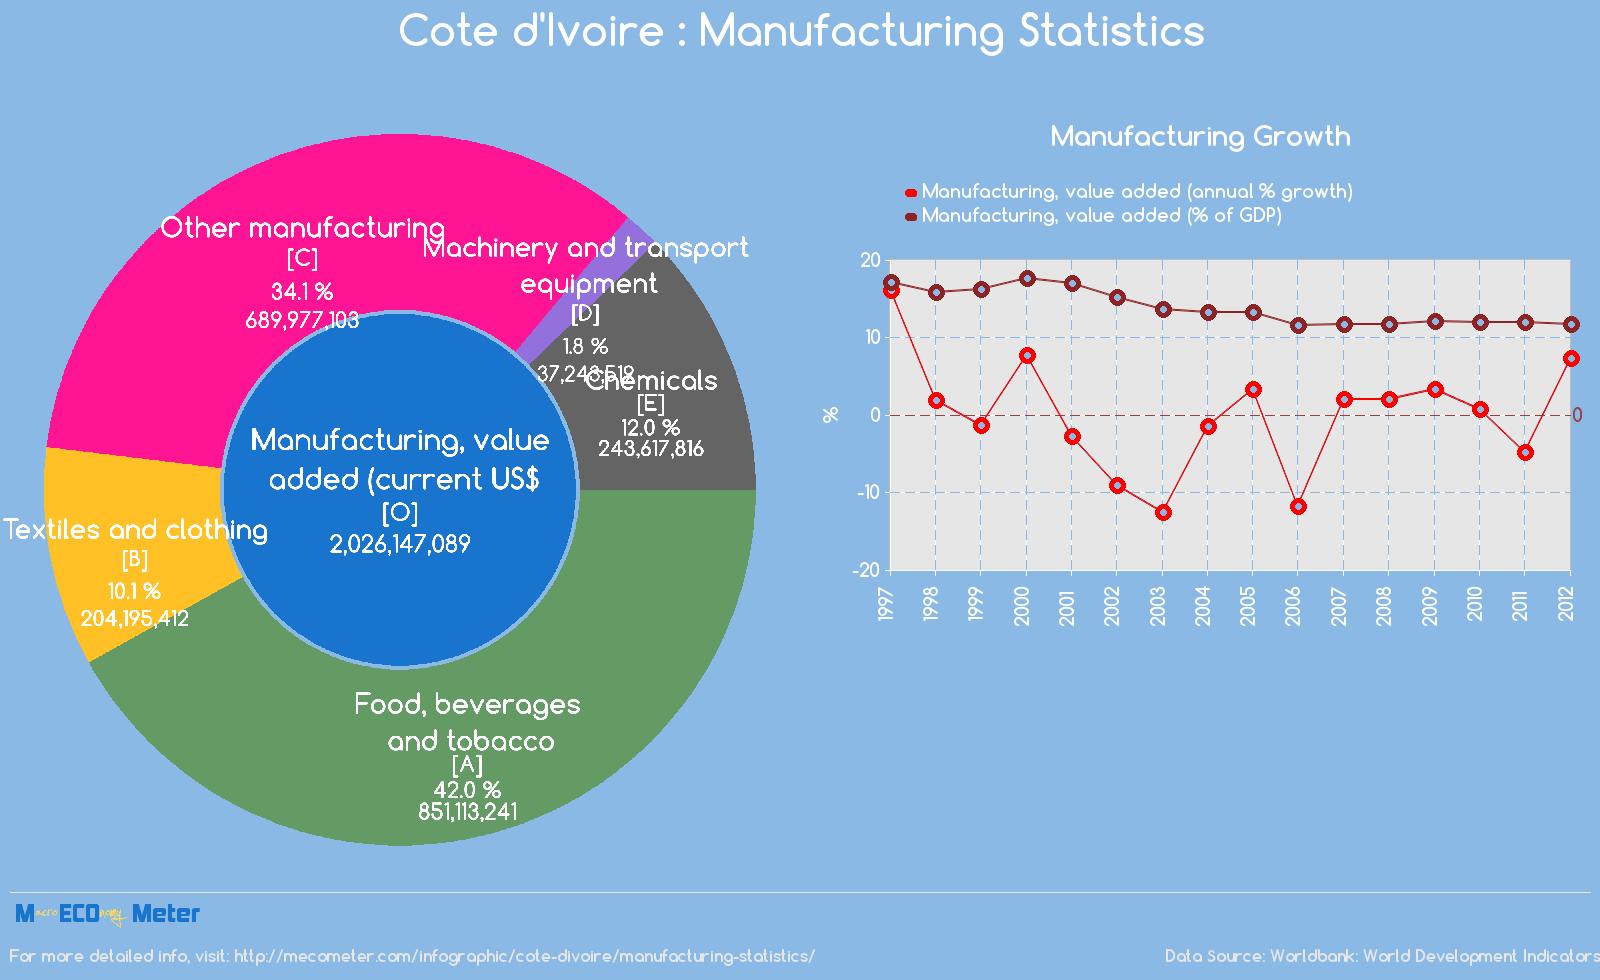 Cote d'Ivoire : Manufacturing Statistics